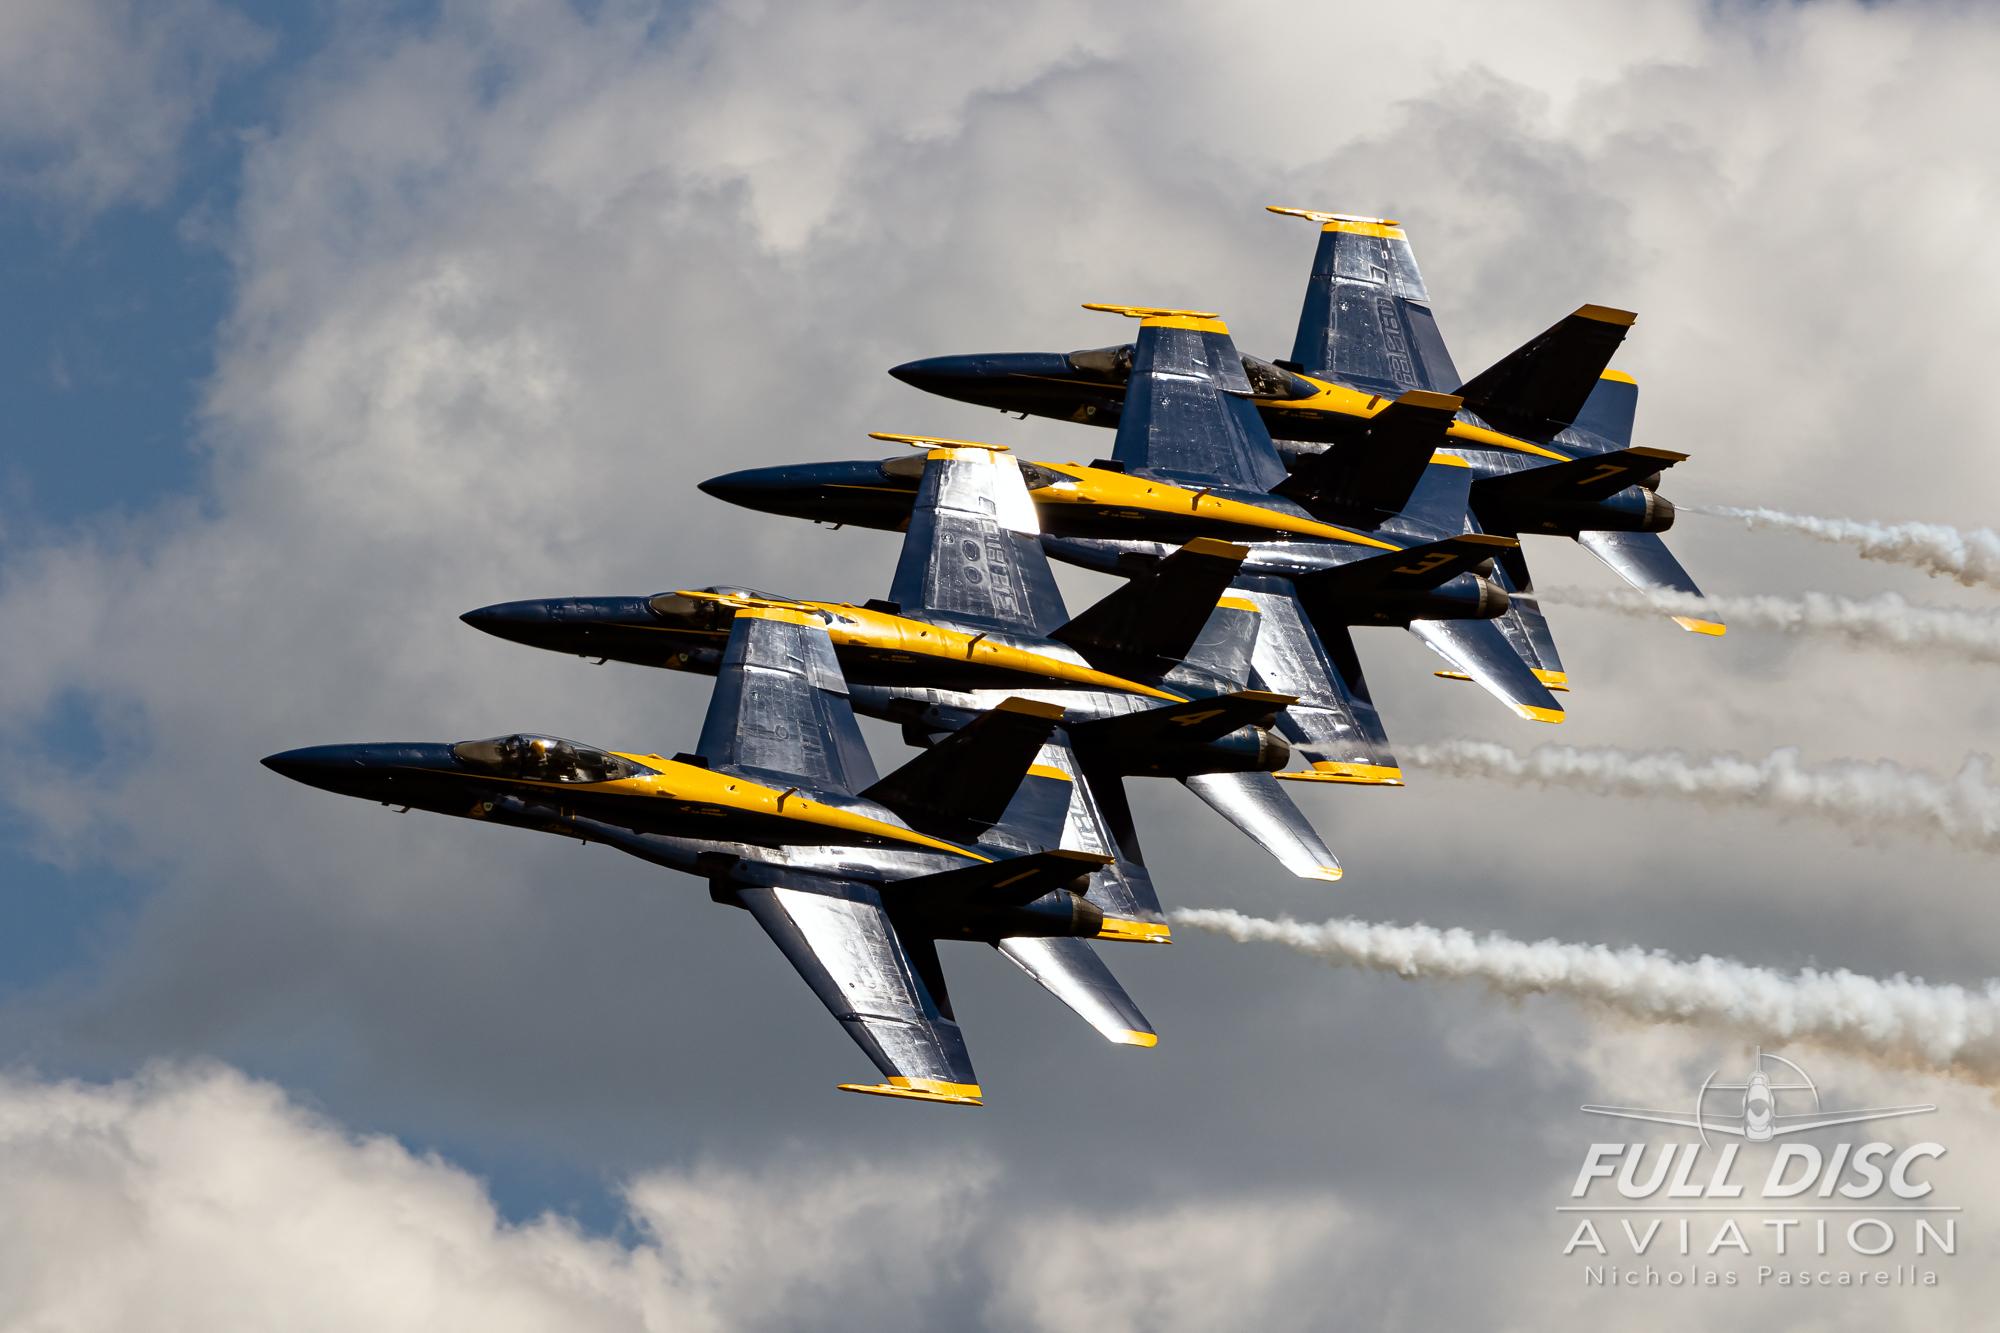 nickpascarella_fulldiscaviation_oceancityairshow_aviation_blueangels_glare.jpg